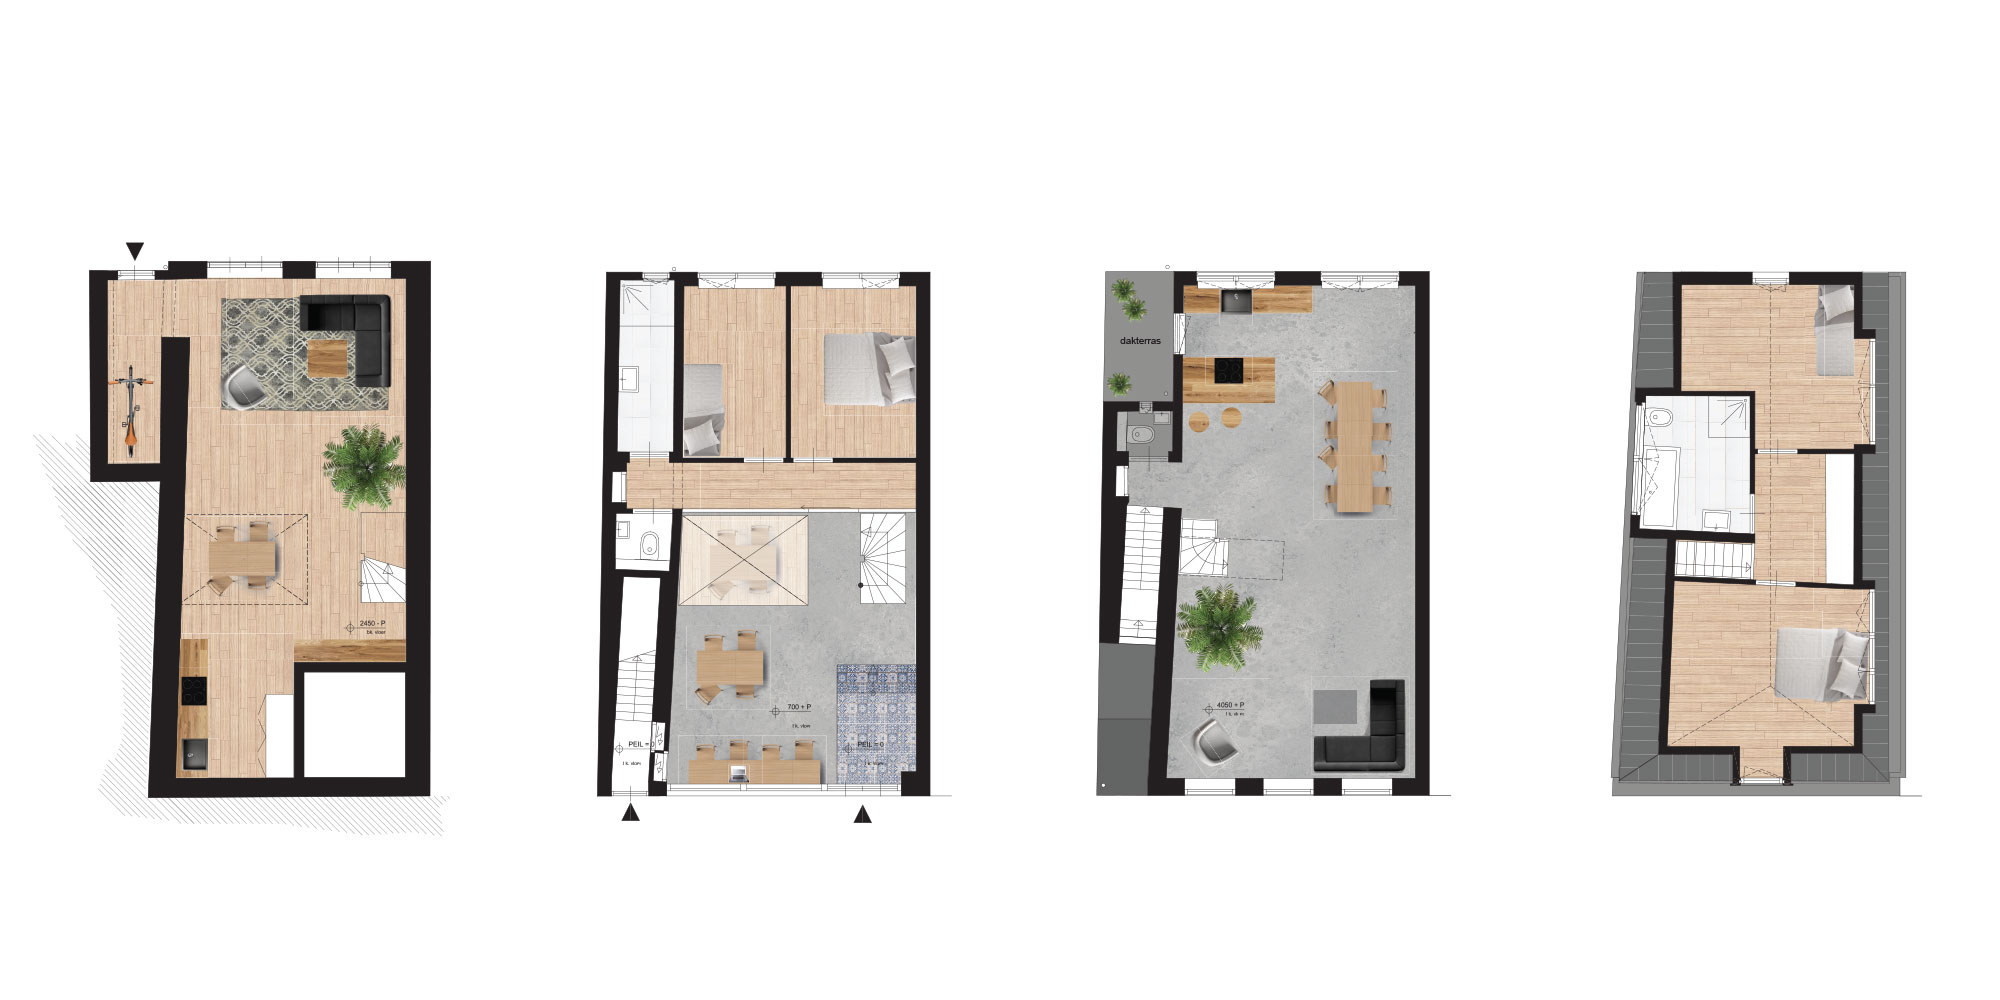 verkooptekening-schiedam-architect